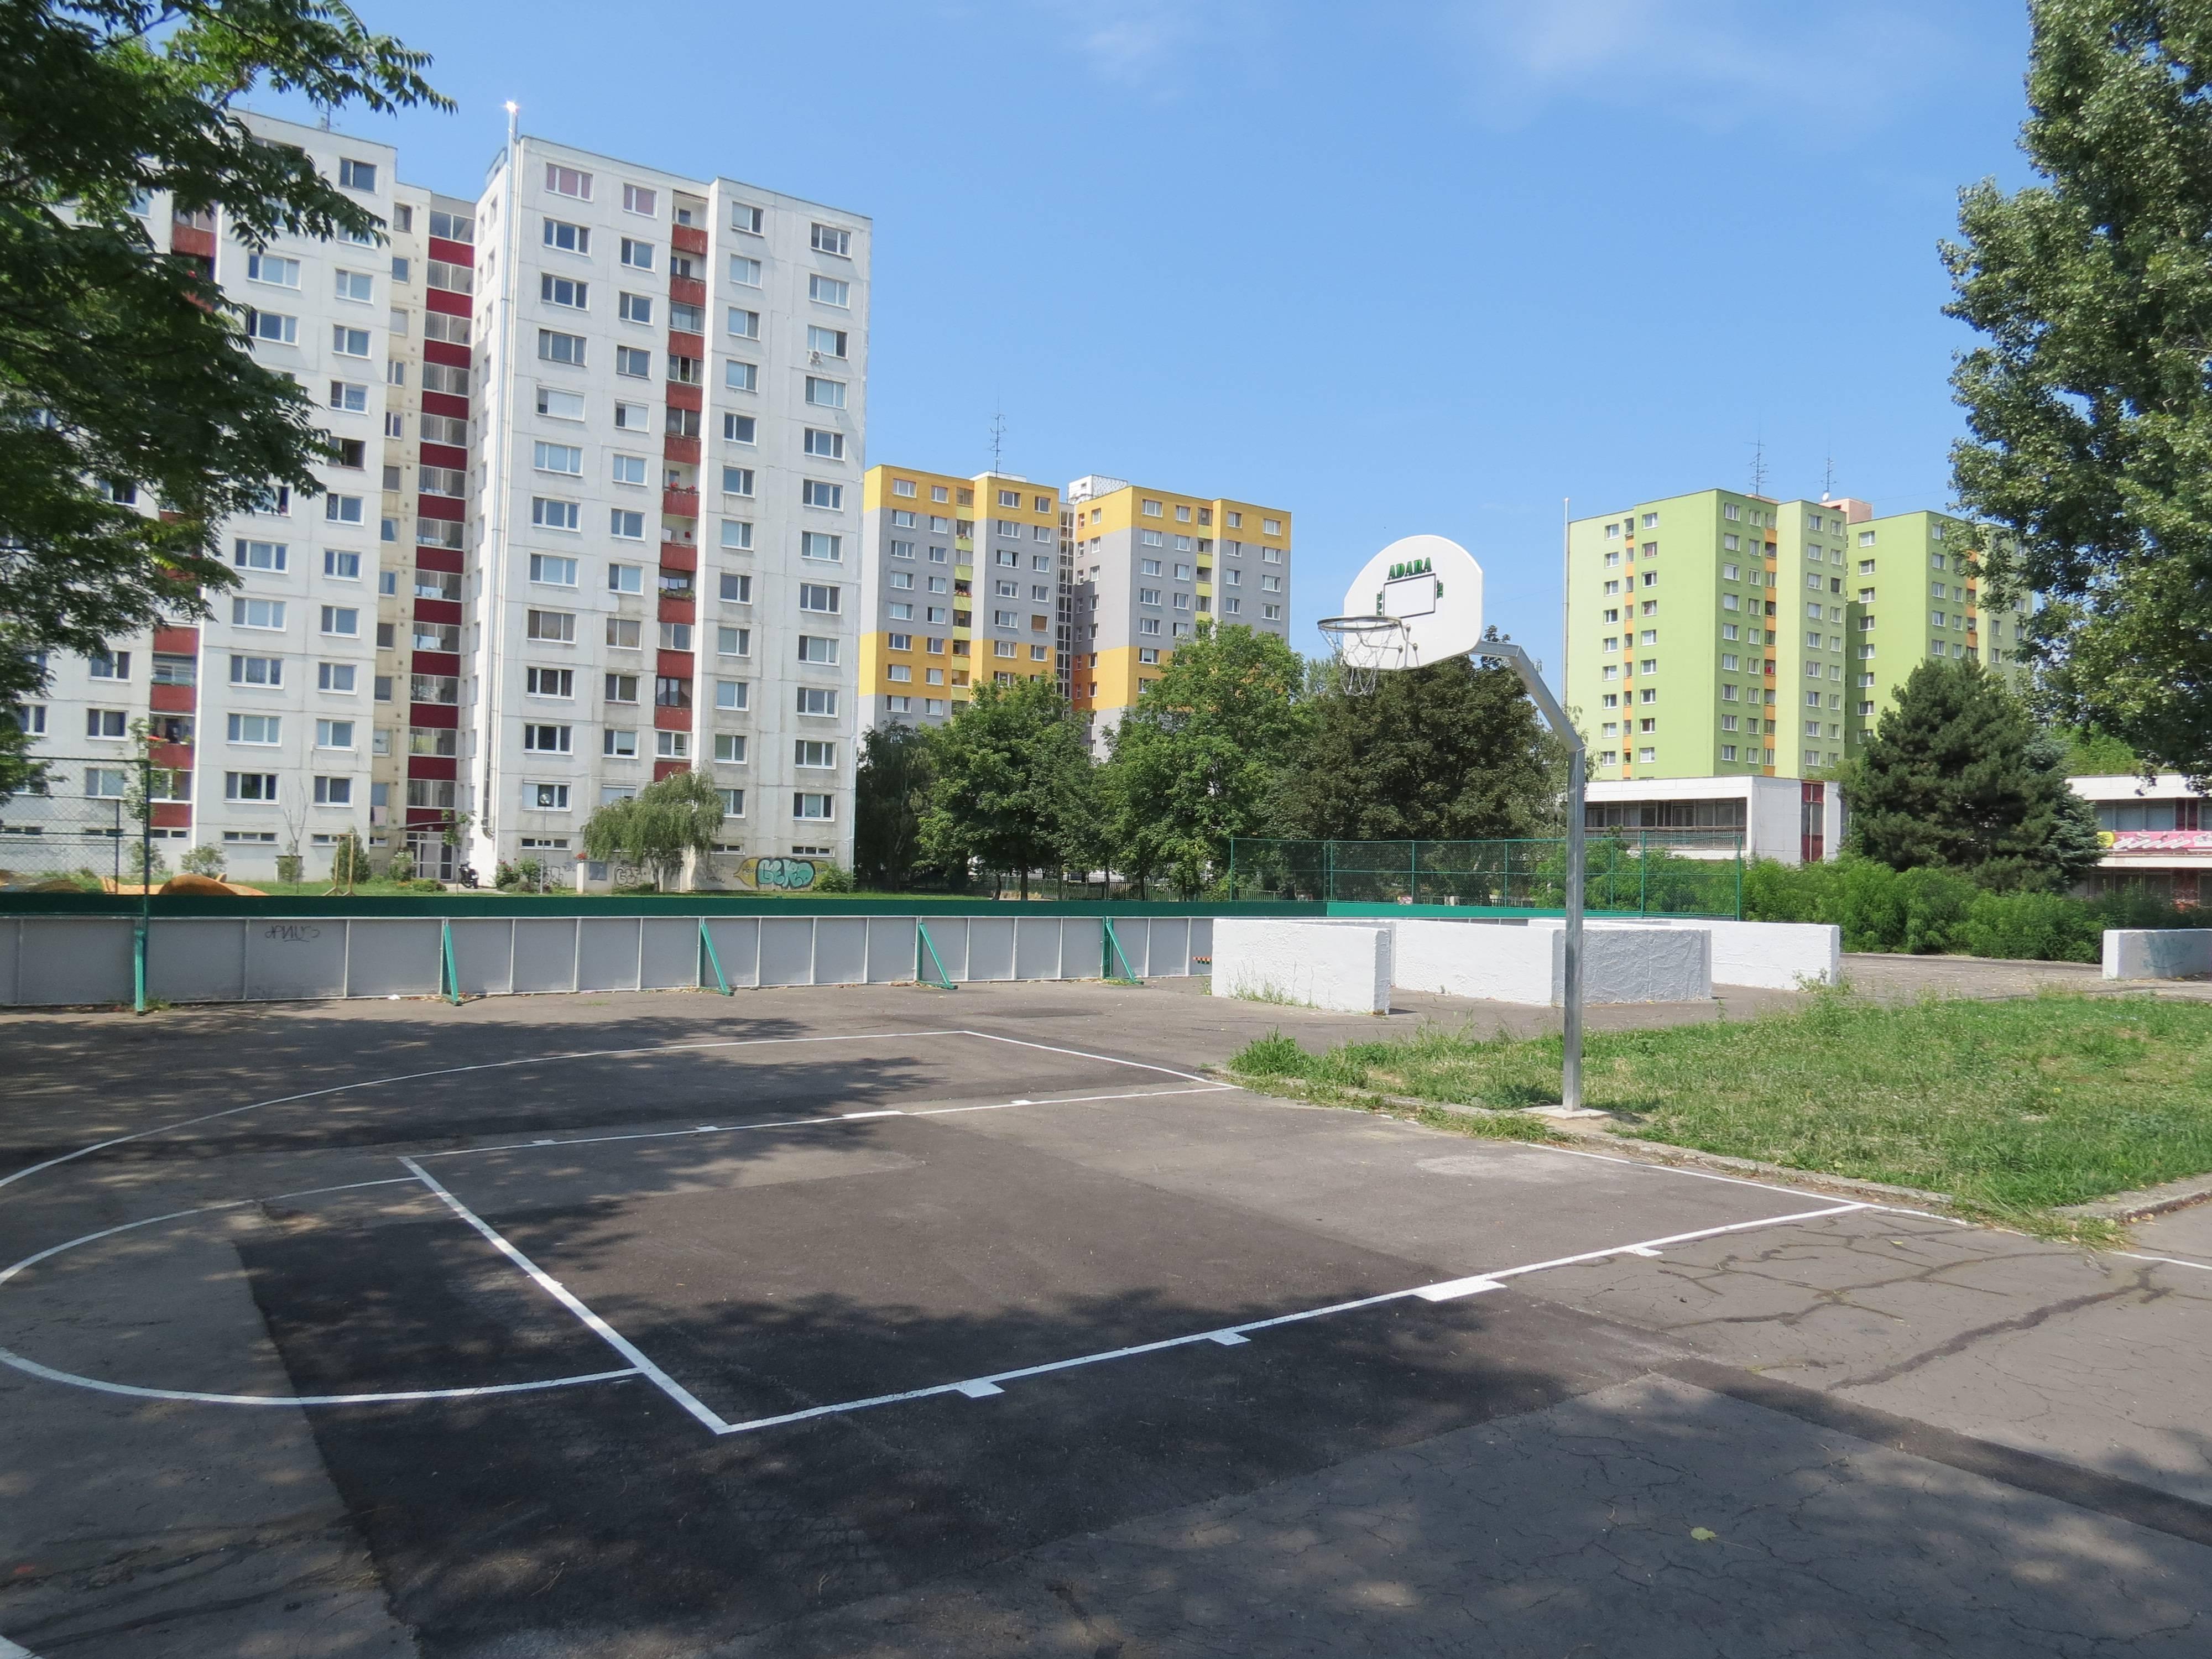 Sportovisko Hrobakova 25a po rekonstrukcii